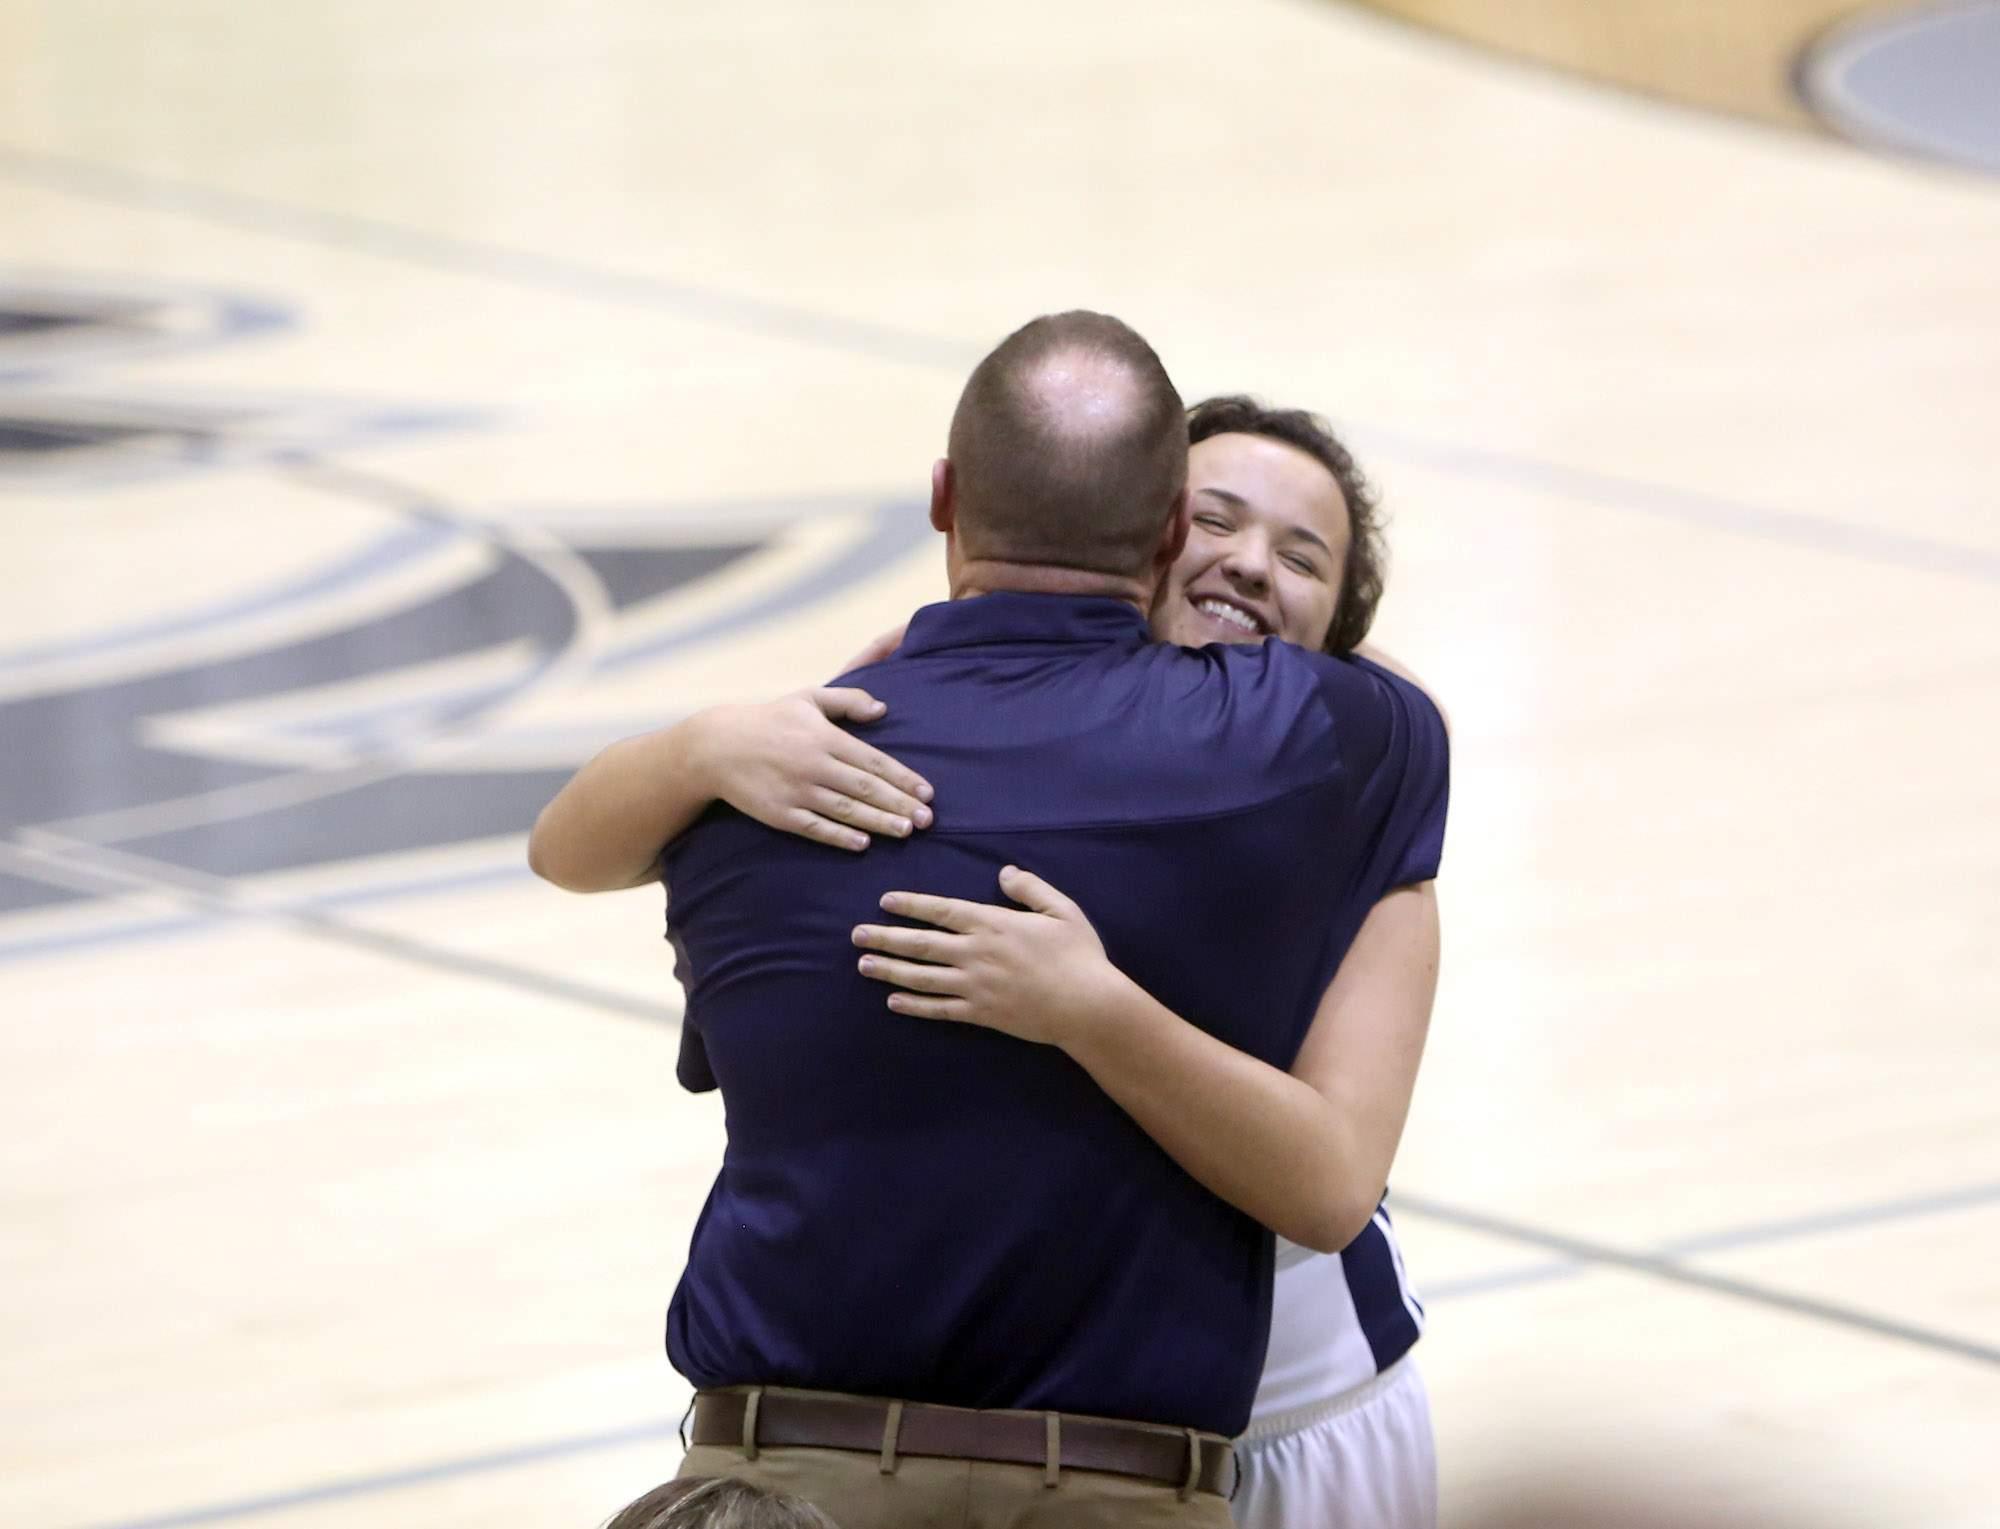 Matt Crain embraces senior Sydney Monje in the final minute.